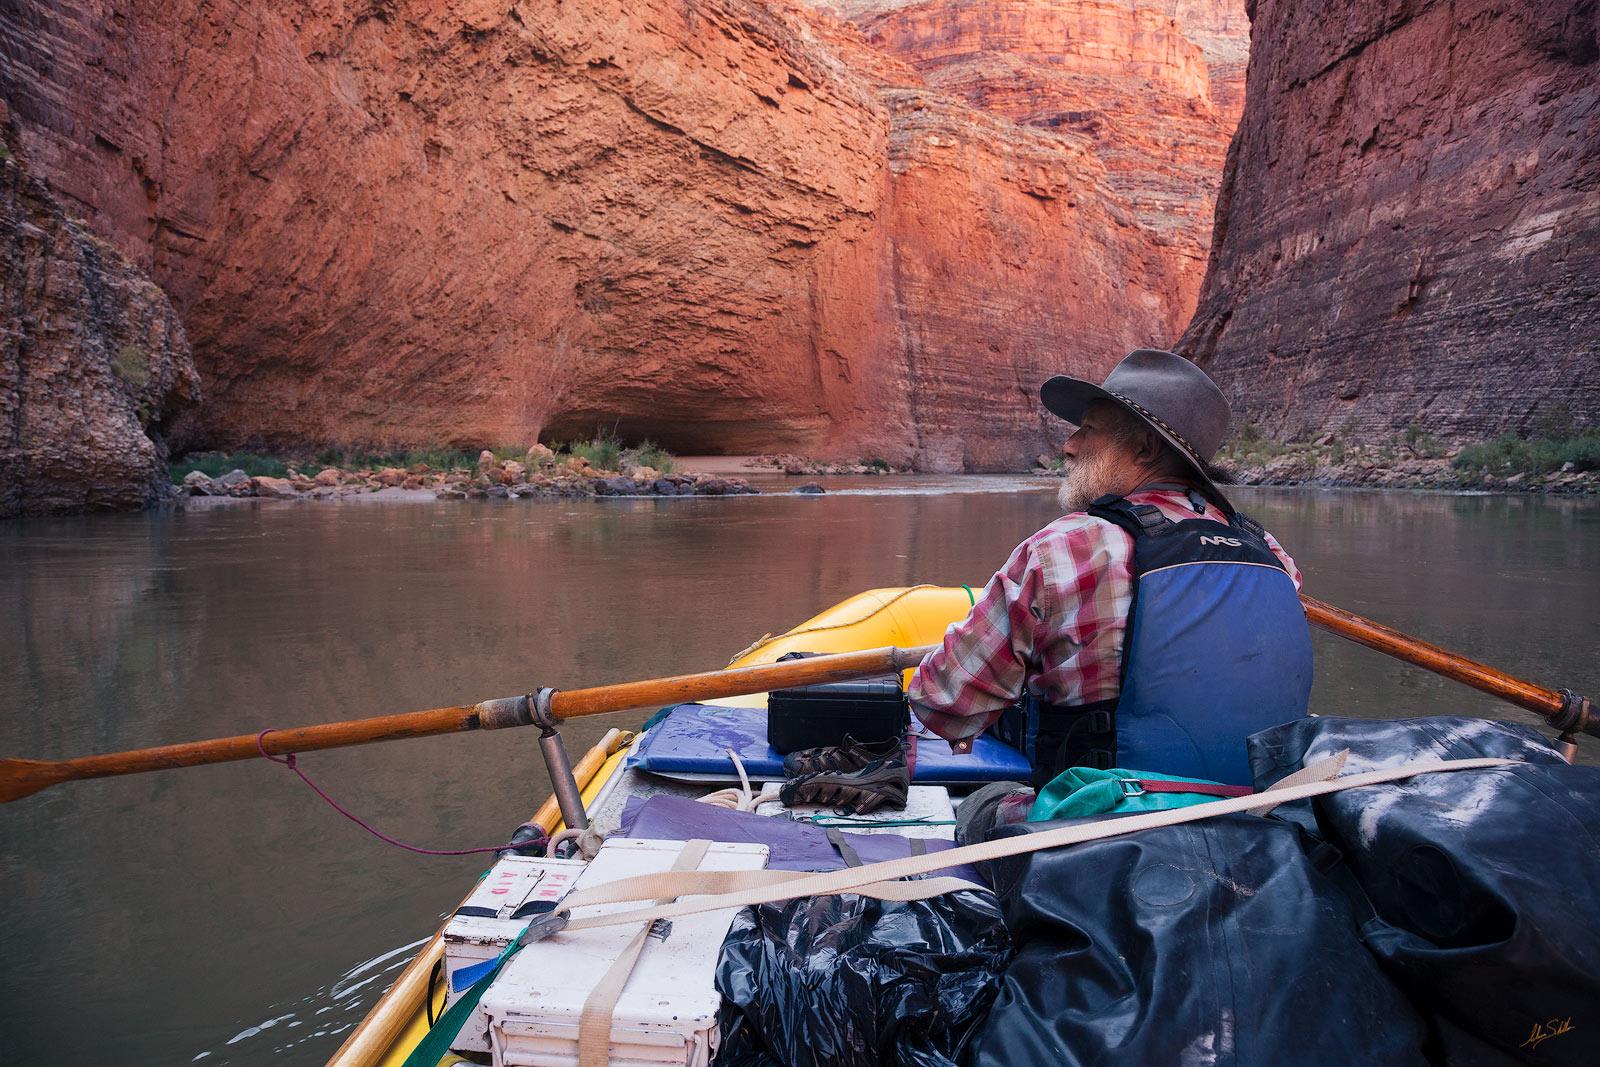 AZ, Arizona, Below the Rim, Colorado River, Expedition, Grand Canyon, Grand Canyon National Park, Marble Canyon, National Park, Raft, Rafting, Rafting the Colorado River, Rafting the Grand Canyon, Red, photo